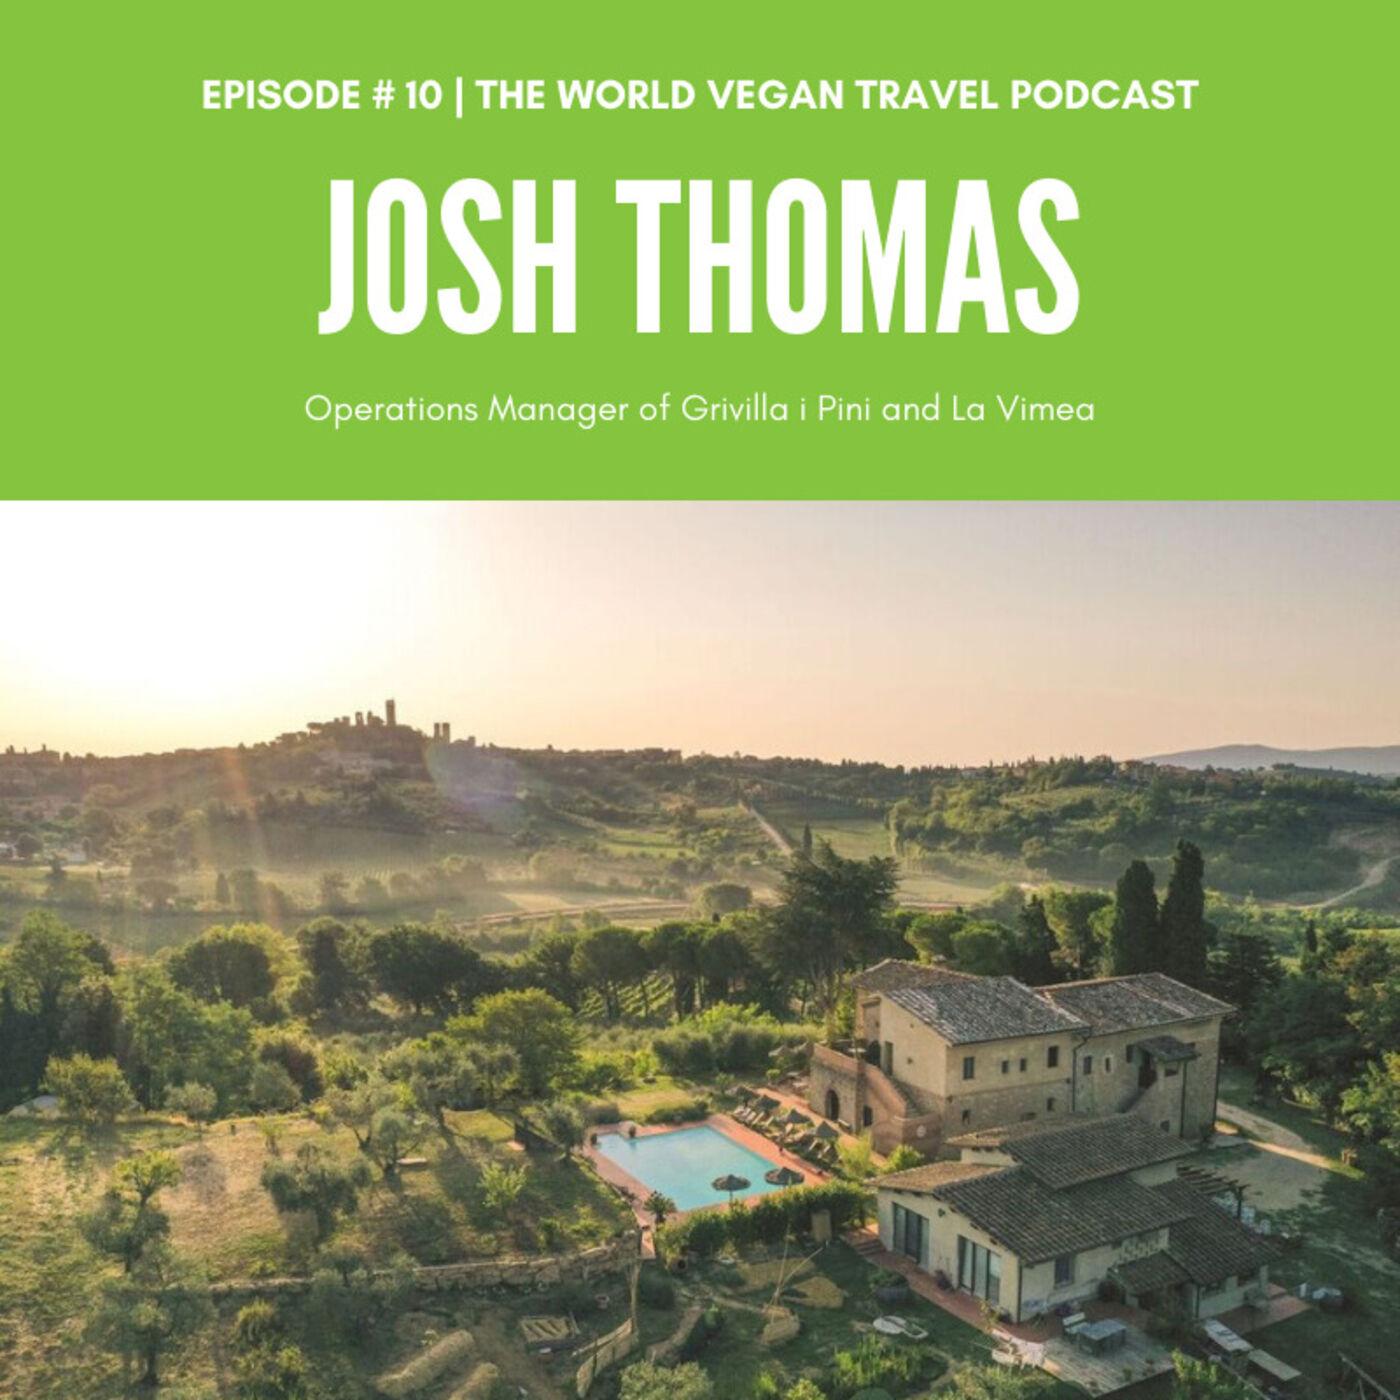 # 10 | Luxury Vegan Hotels in Italy | Josh Thomas